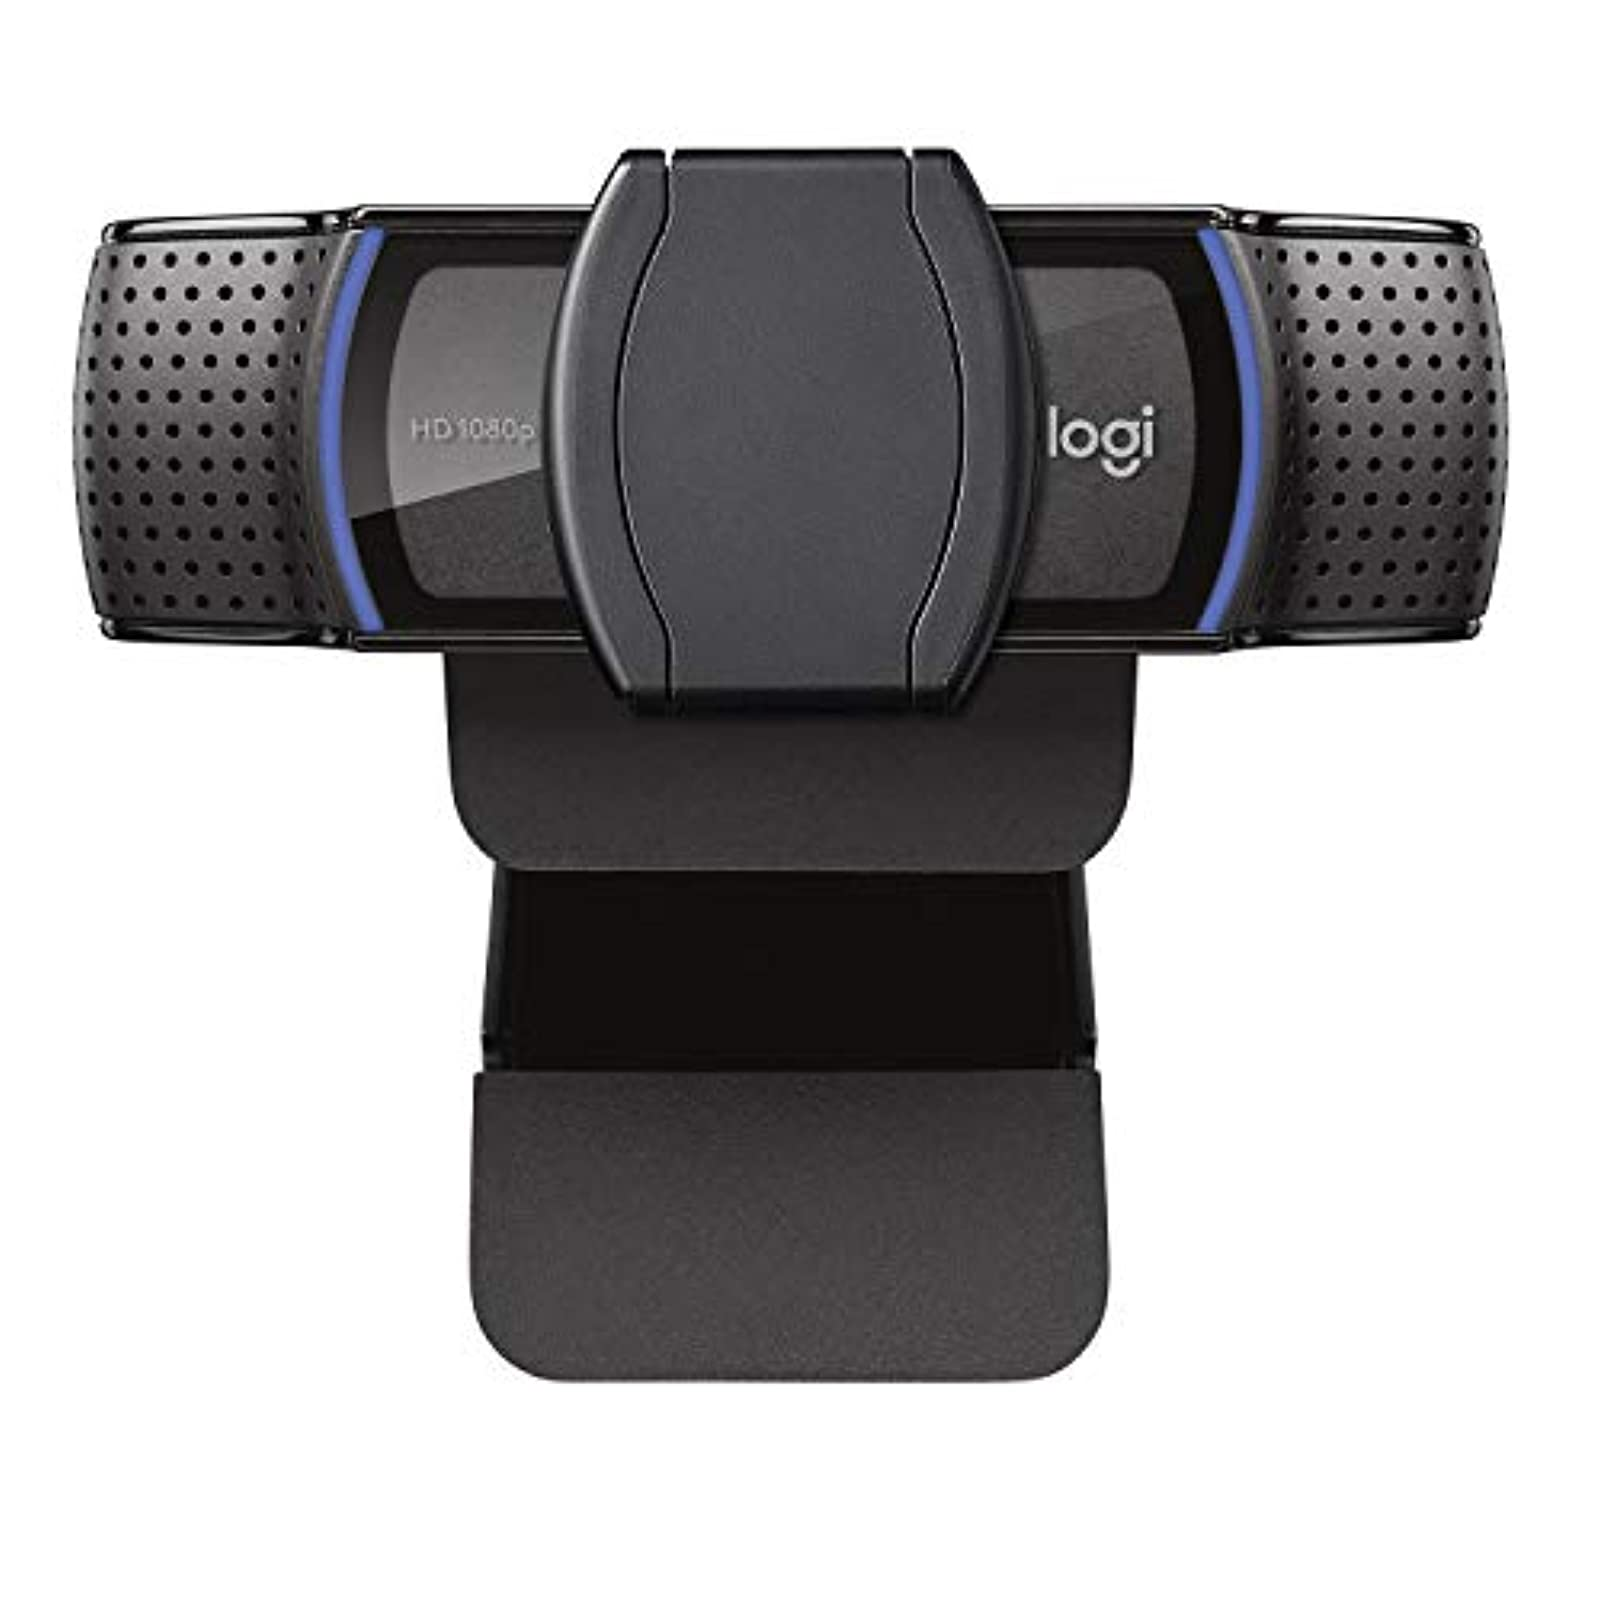 Logitech C920S HD Pro Webcam Full HD 1080P/30FPS Video Calling Clear Stereo Audi